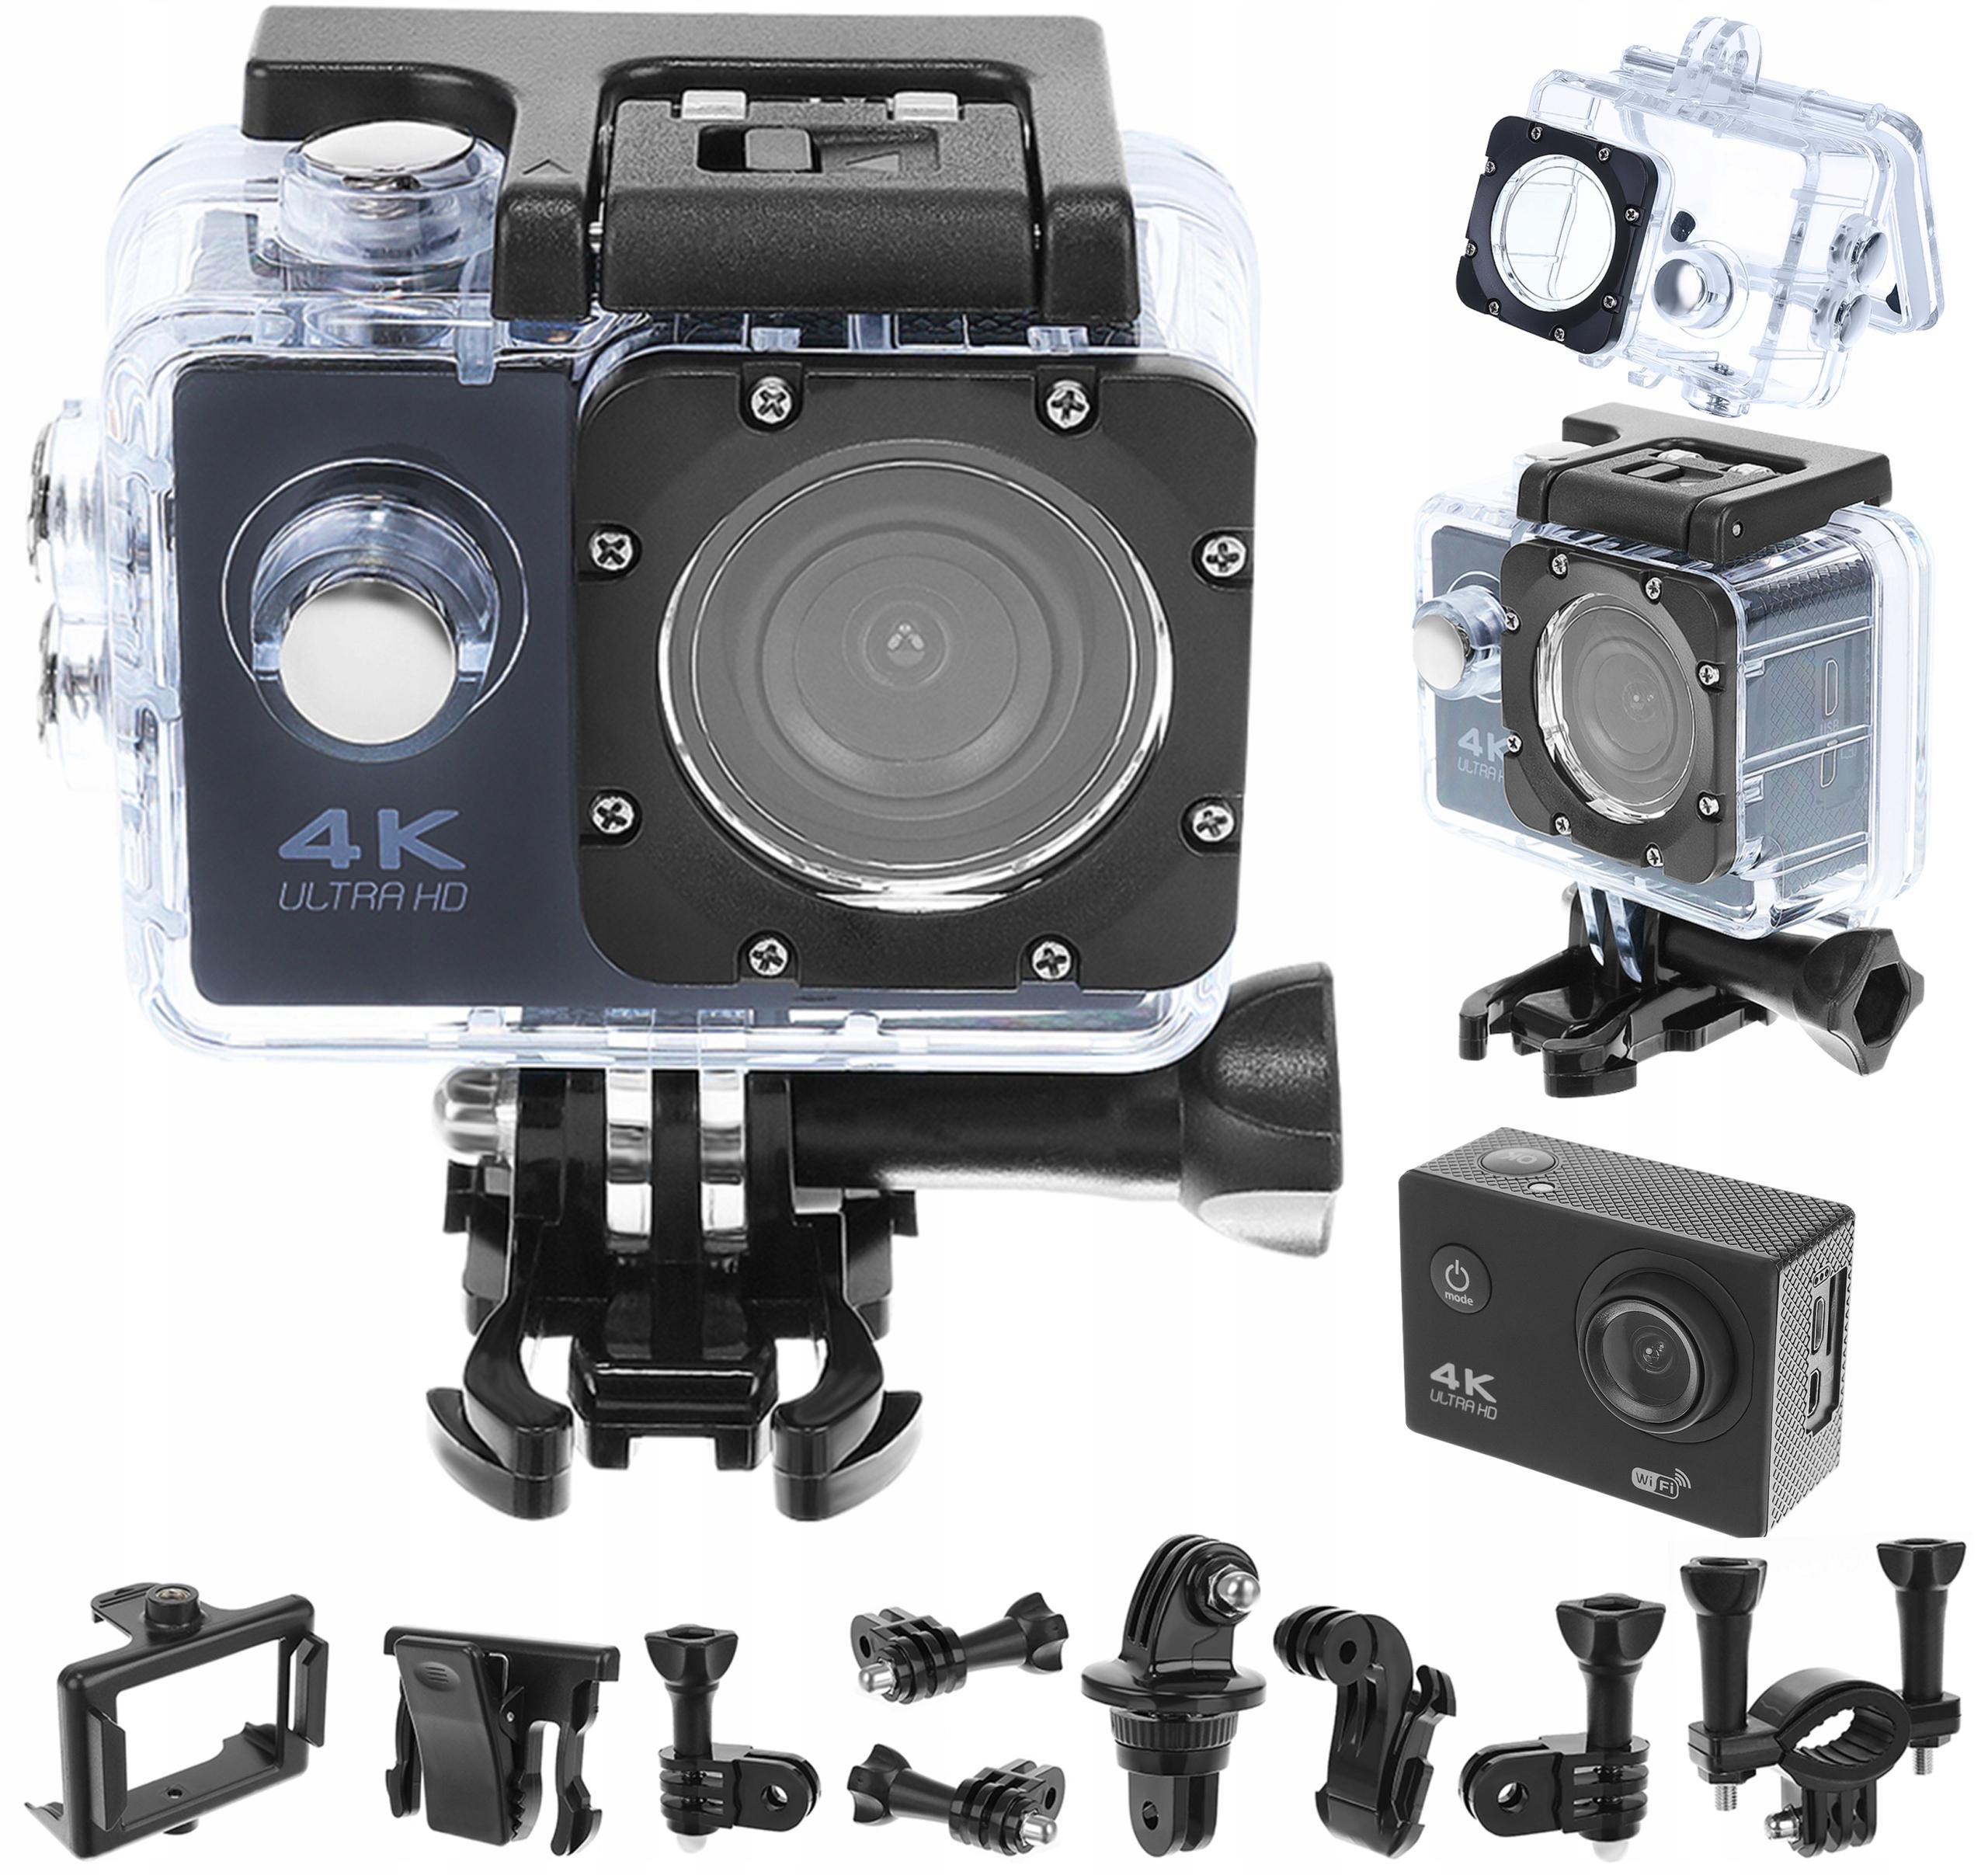 4K Спортивная камера Веб-камера Водонепроницаемая WiFi SD32GB